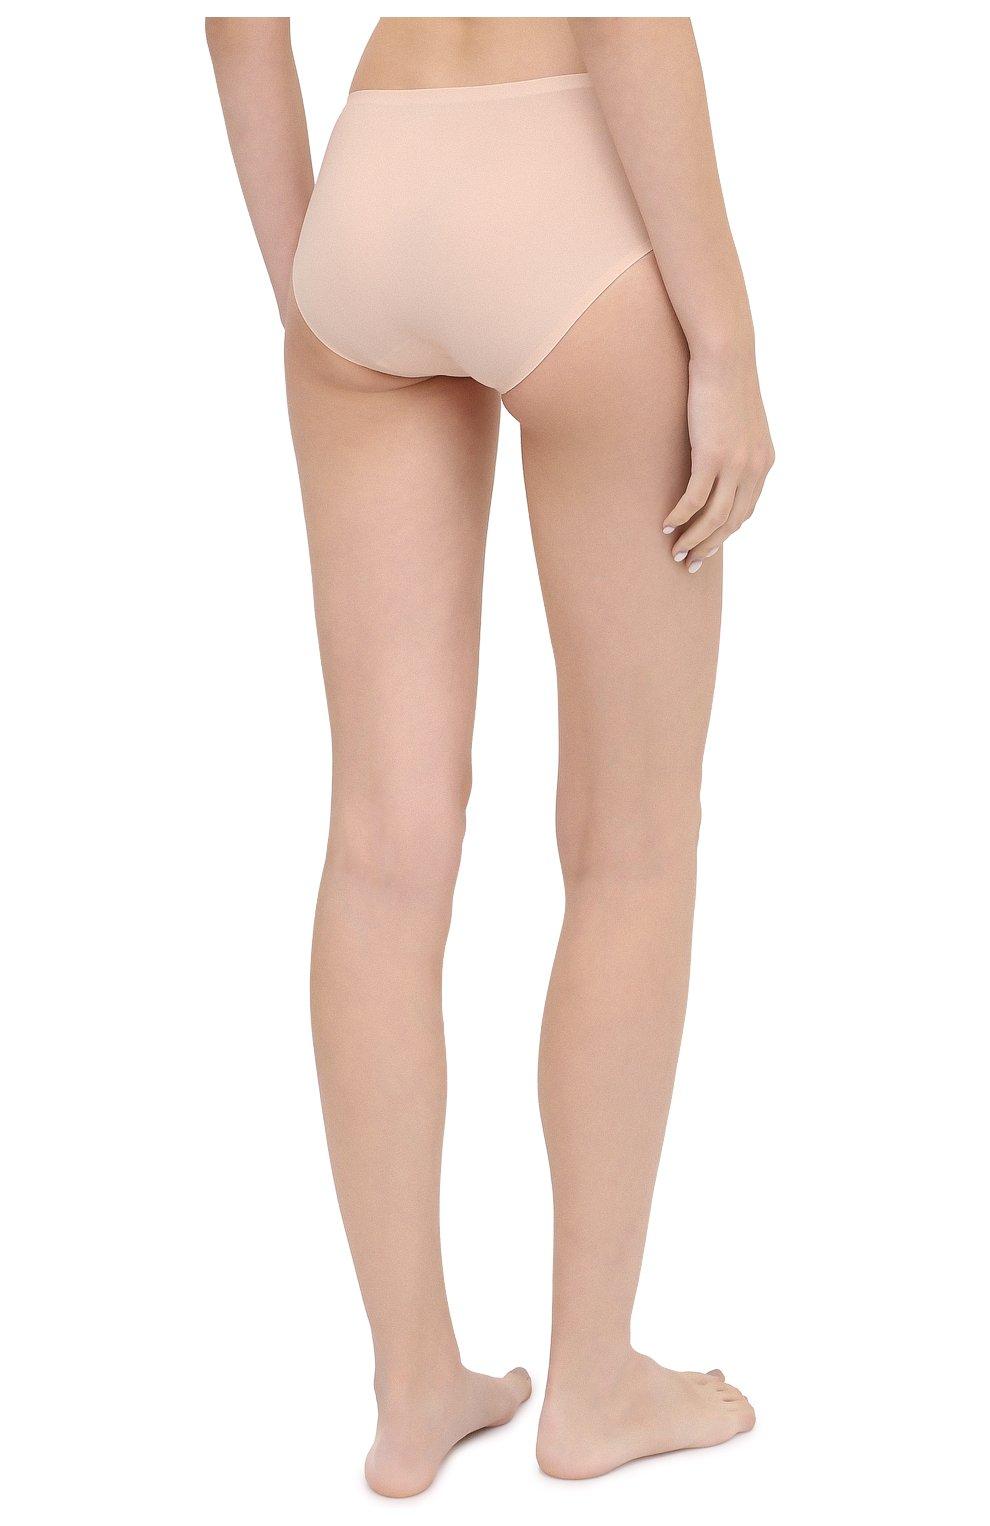 Женские трусы-шорты CHANTELLE бежевого цвета, арт. C26440 | Фото 3